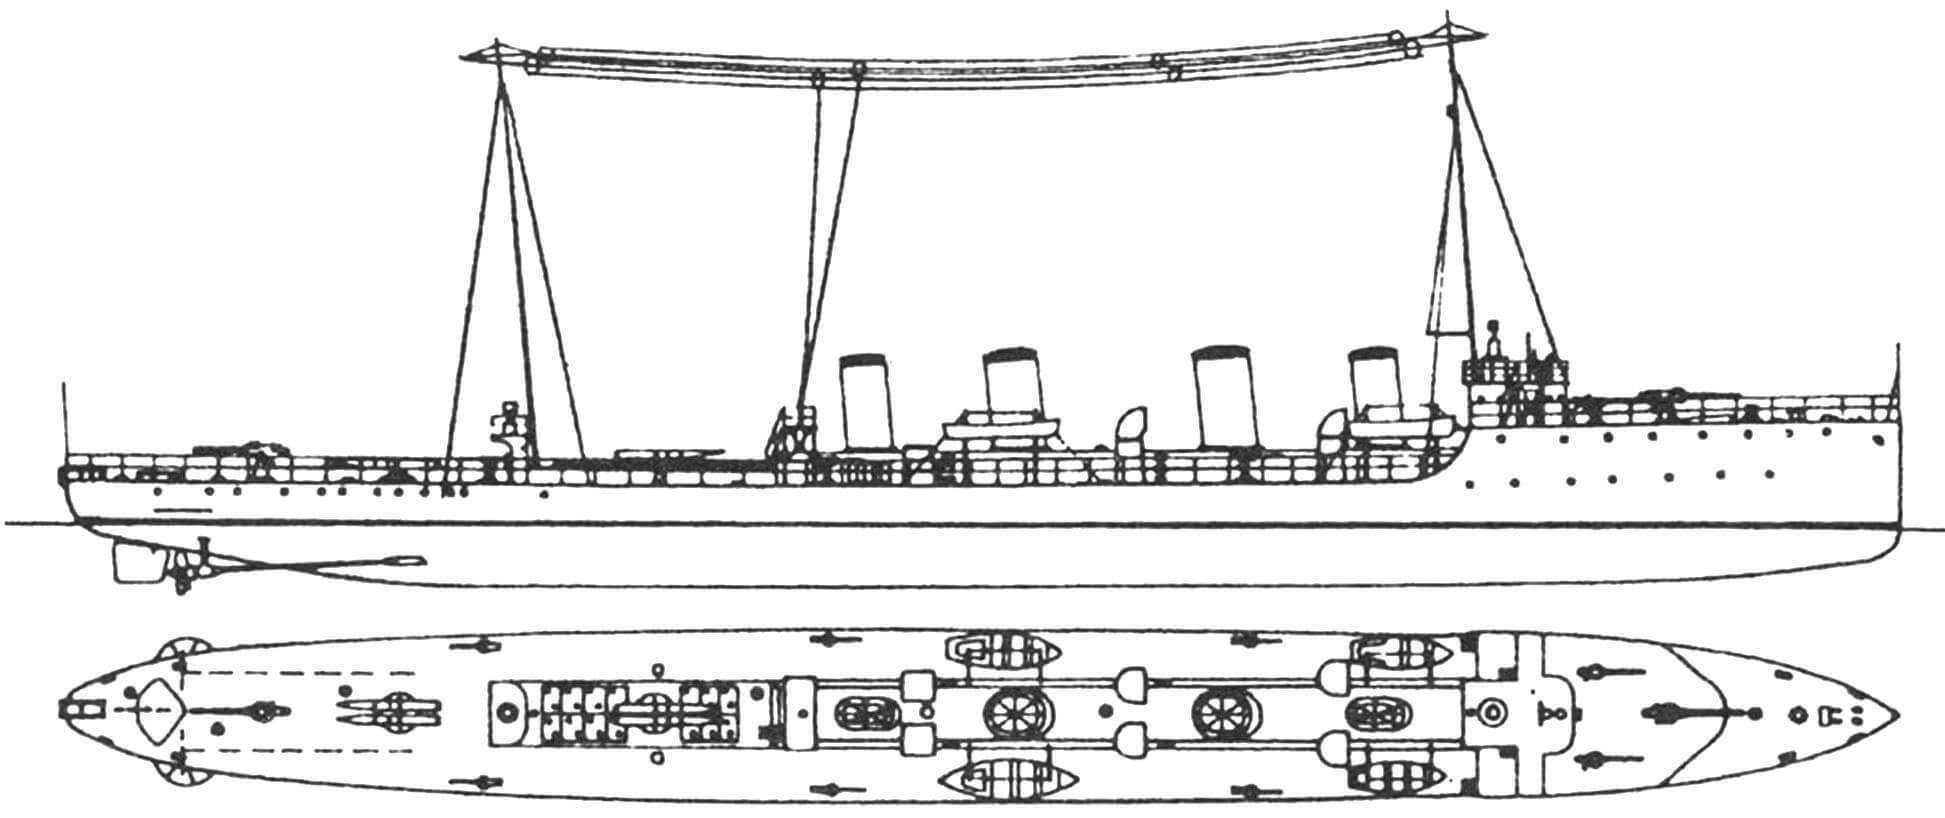 "193. Эсминец ""Триглав"" (II), Австро-Венгрия, 1917 г."